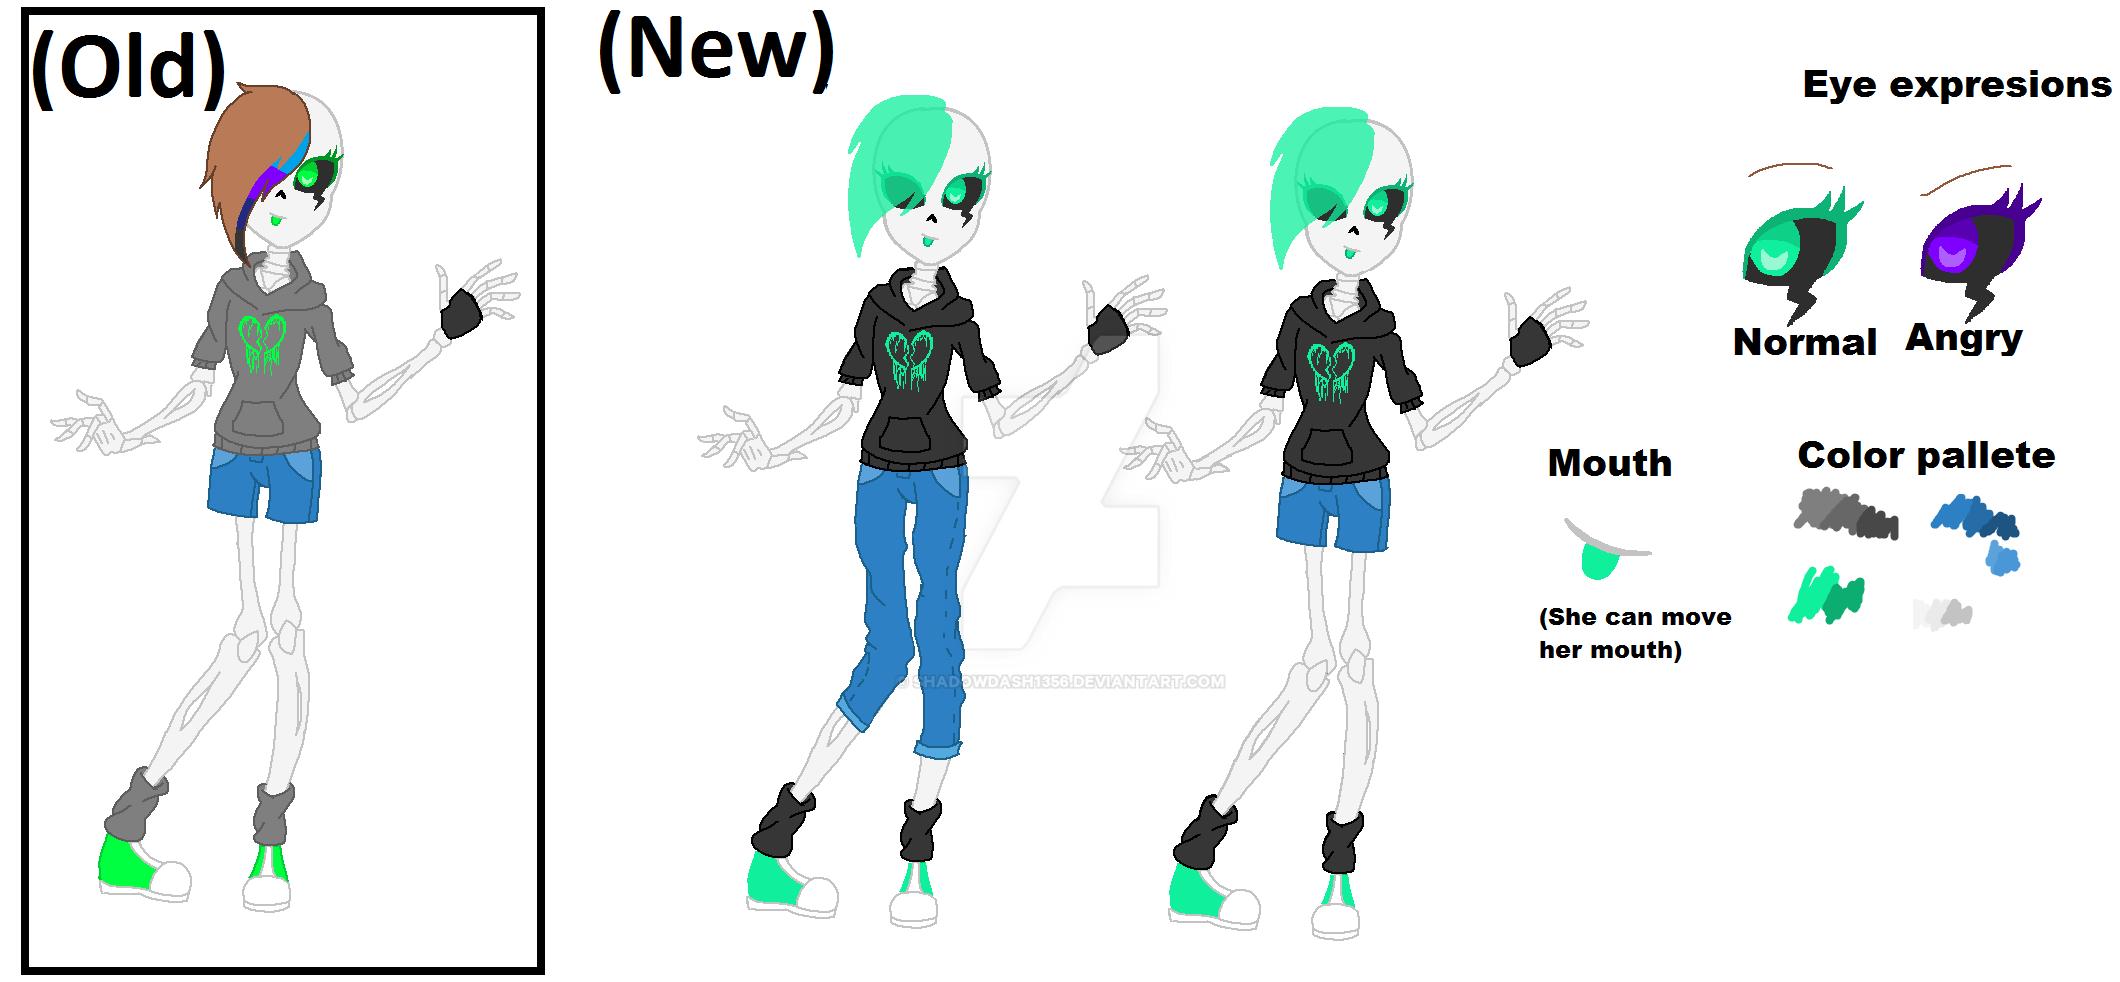 Undertale Oc Nova Old Vs New Design By Shadowdash1356 On